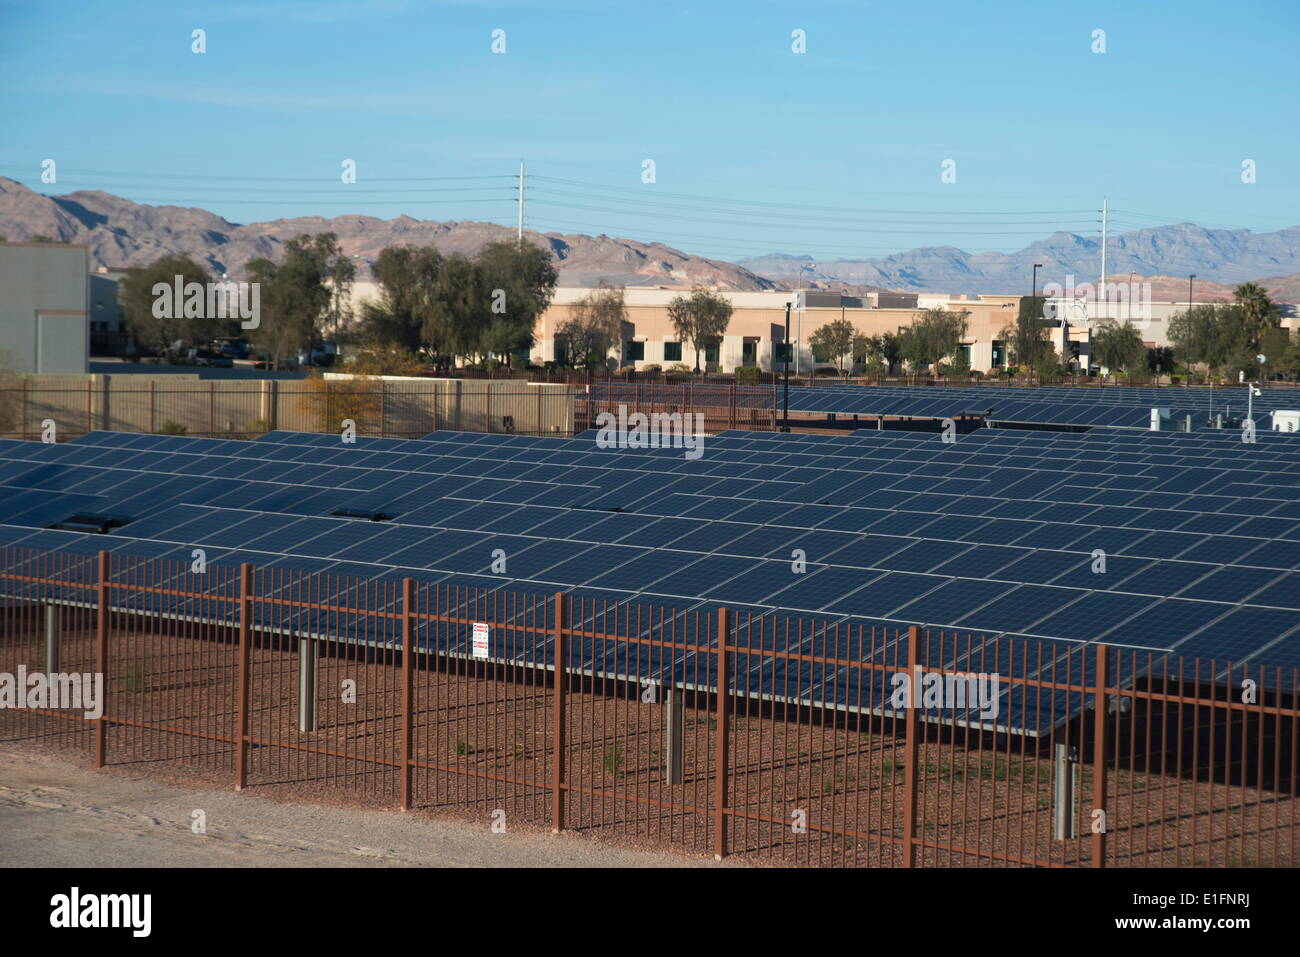 Large bank of solar panels, Las Vegas, Nevada, United States of America, North America - Stock Image